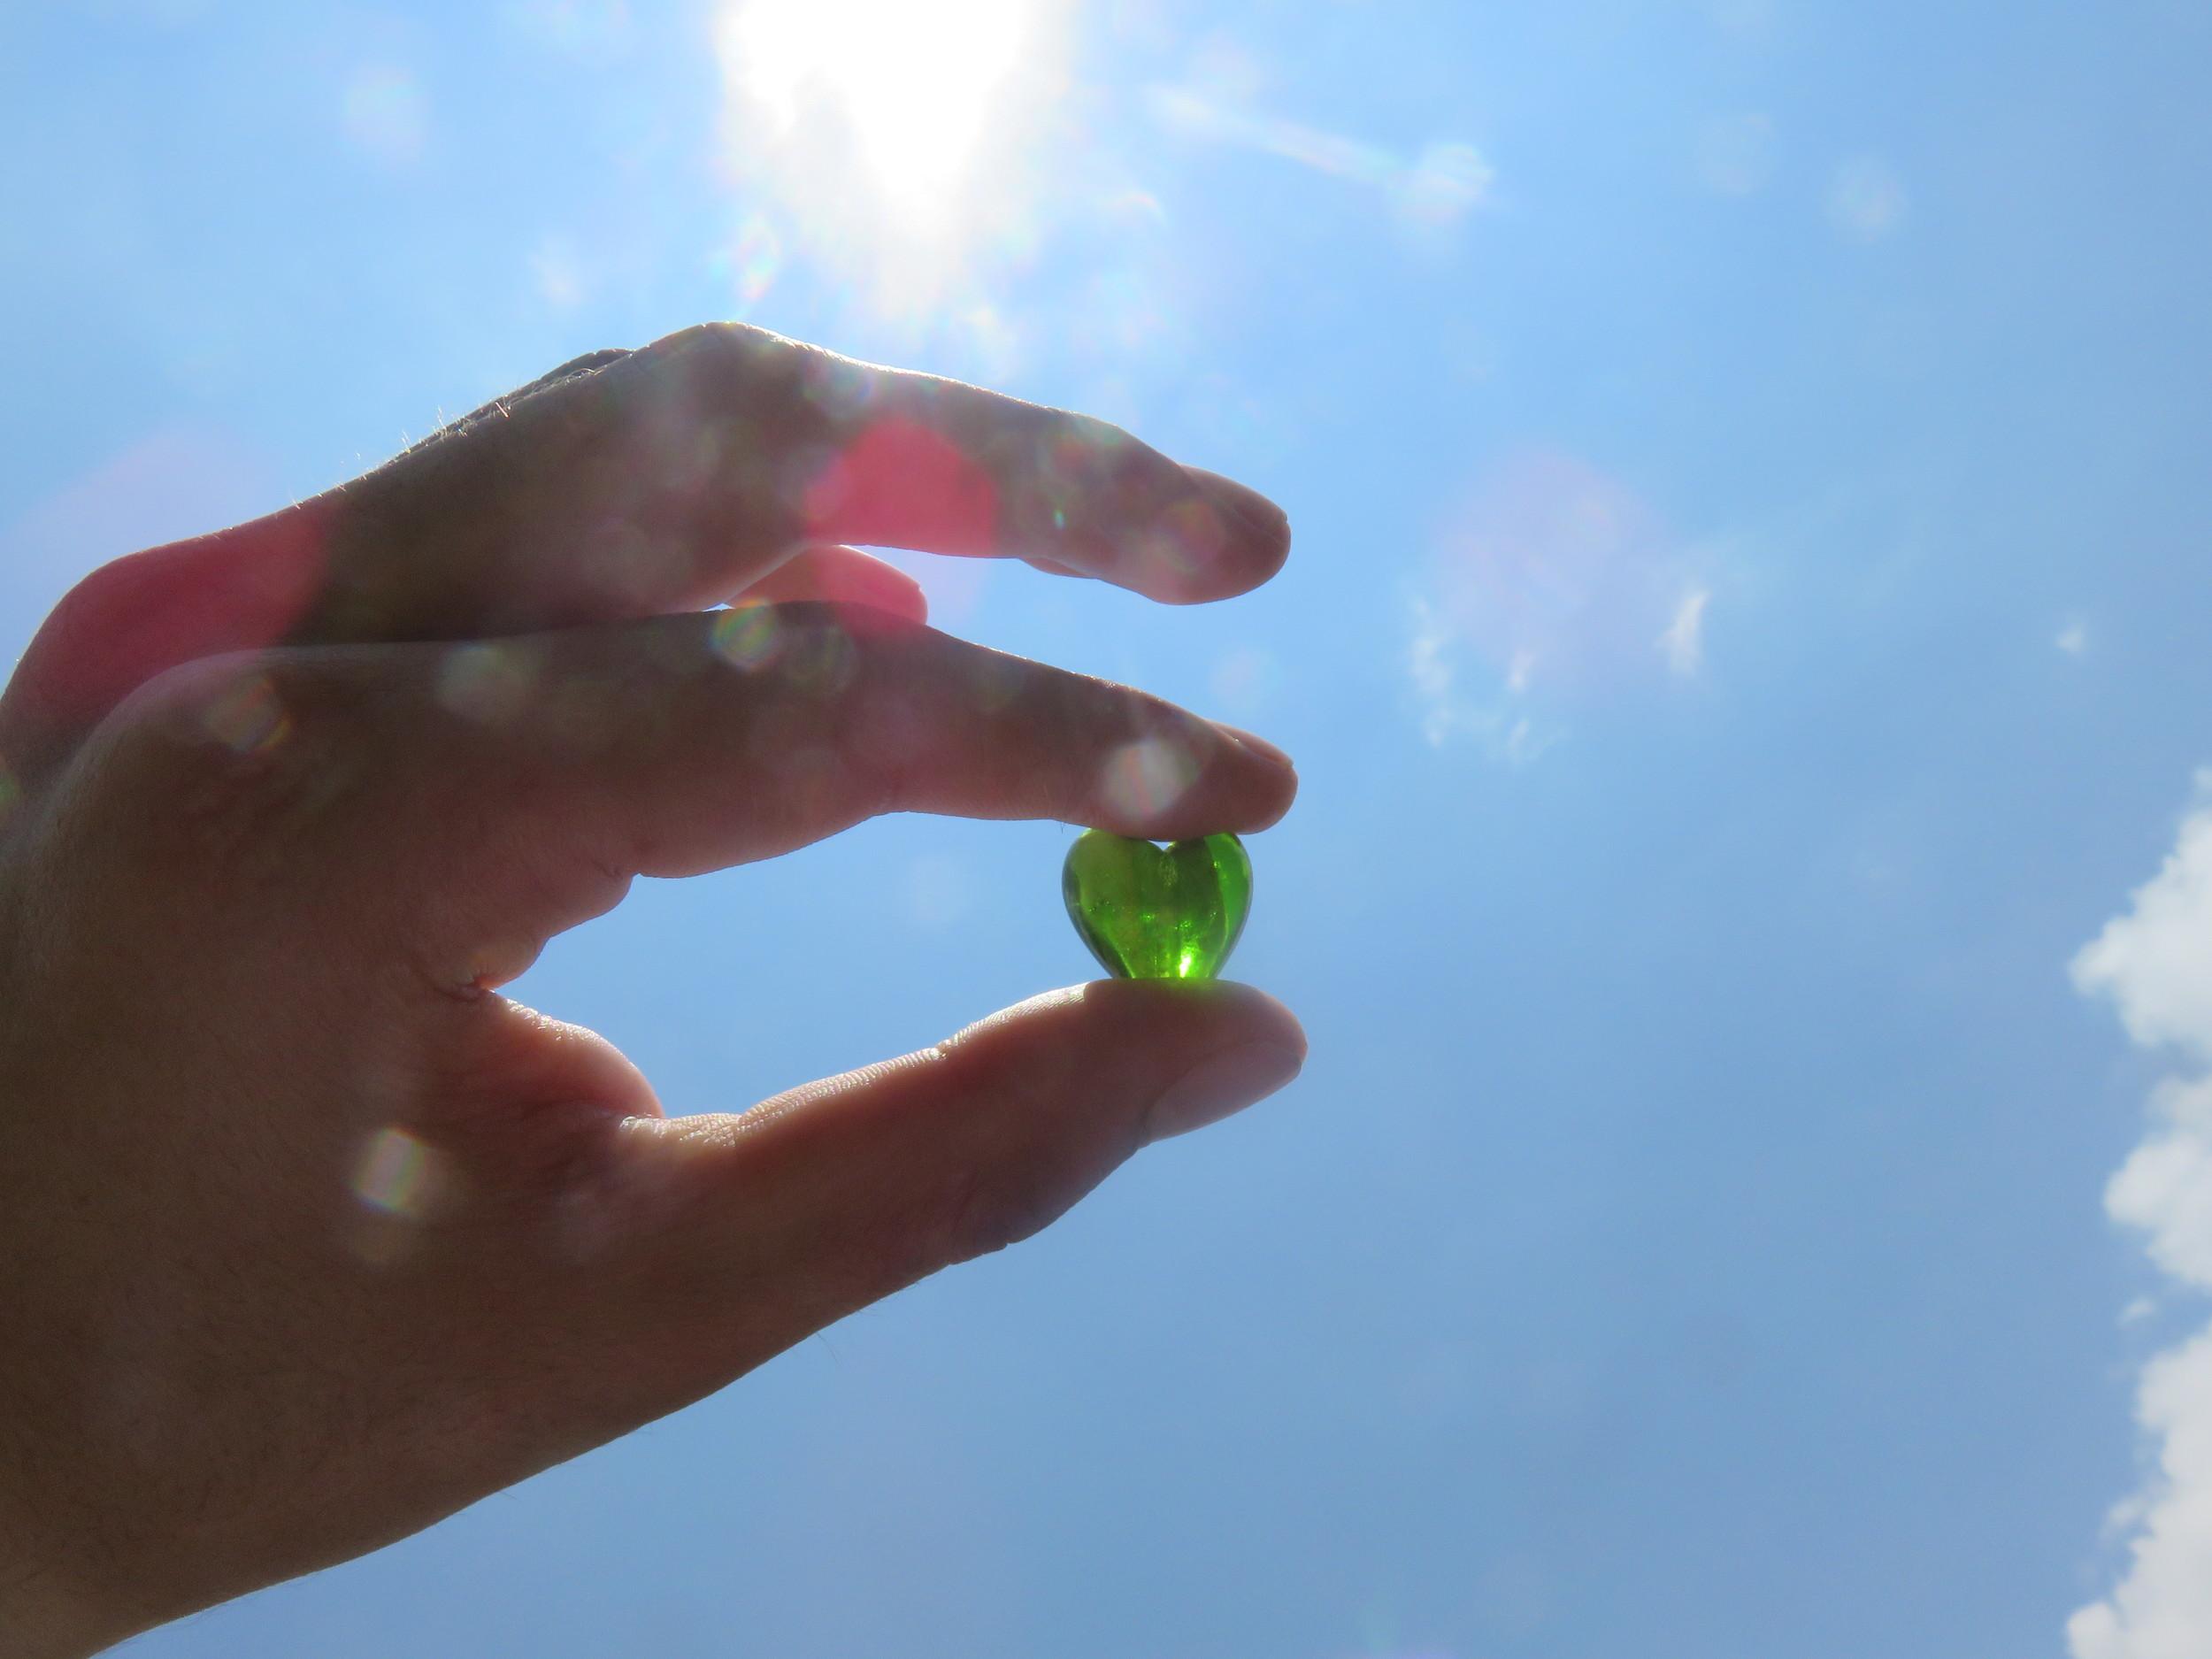 heart-shaped crystal